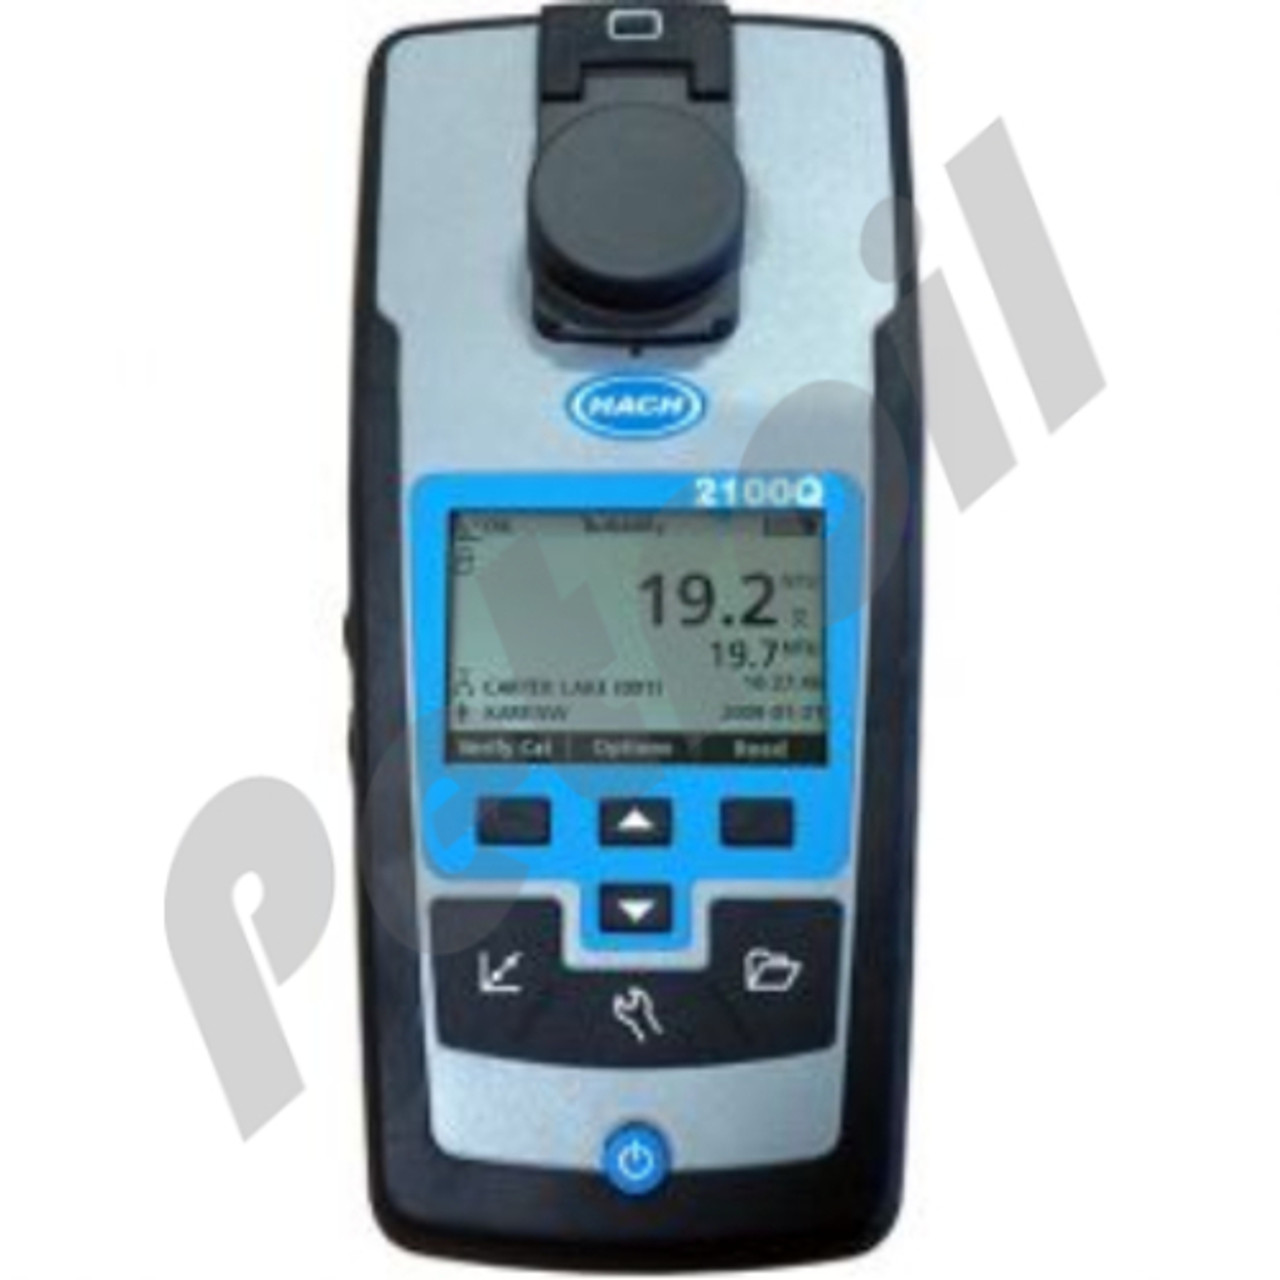 (Case of 1) 2100Q Hach Portable Turbidimeter